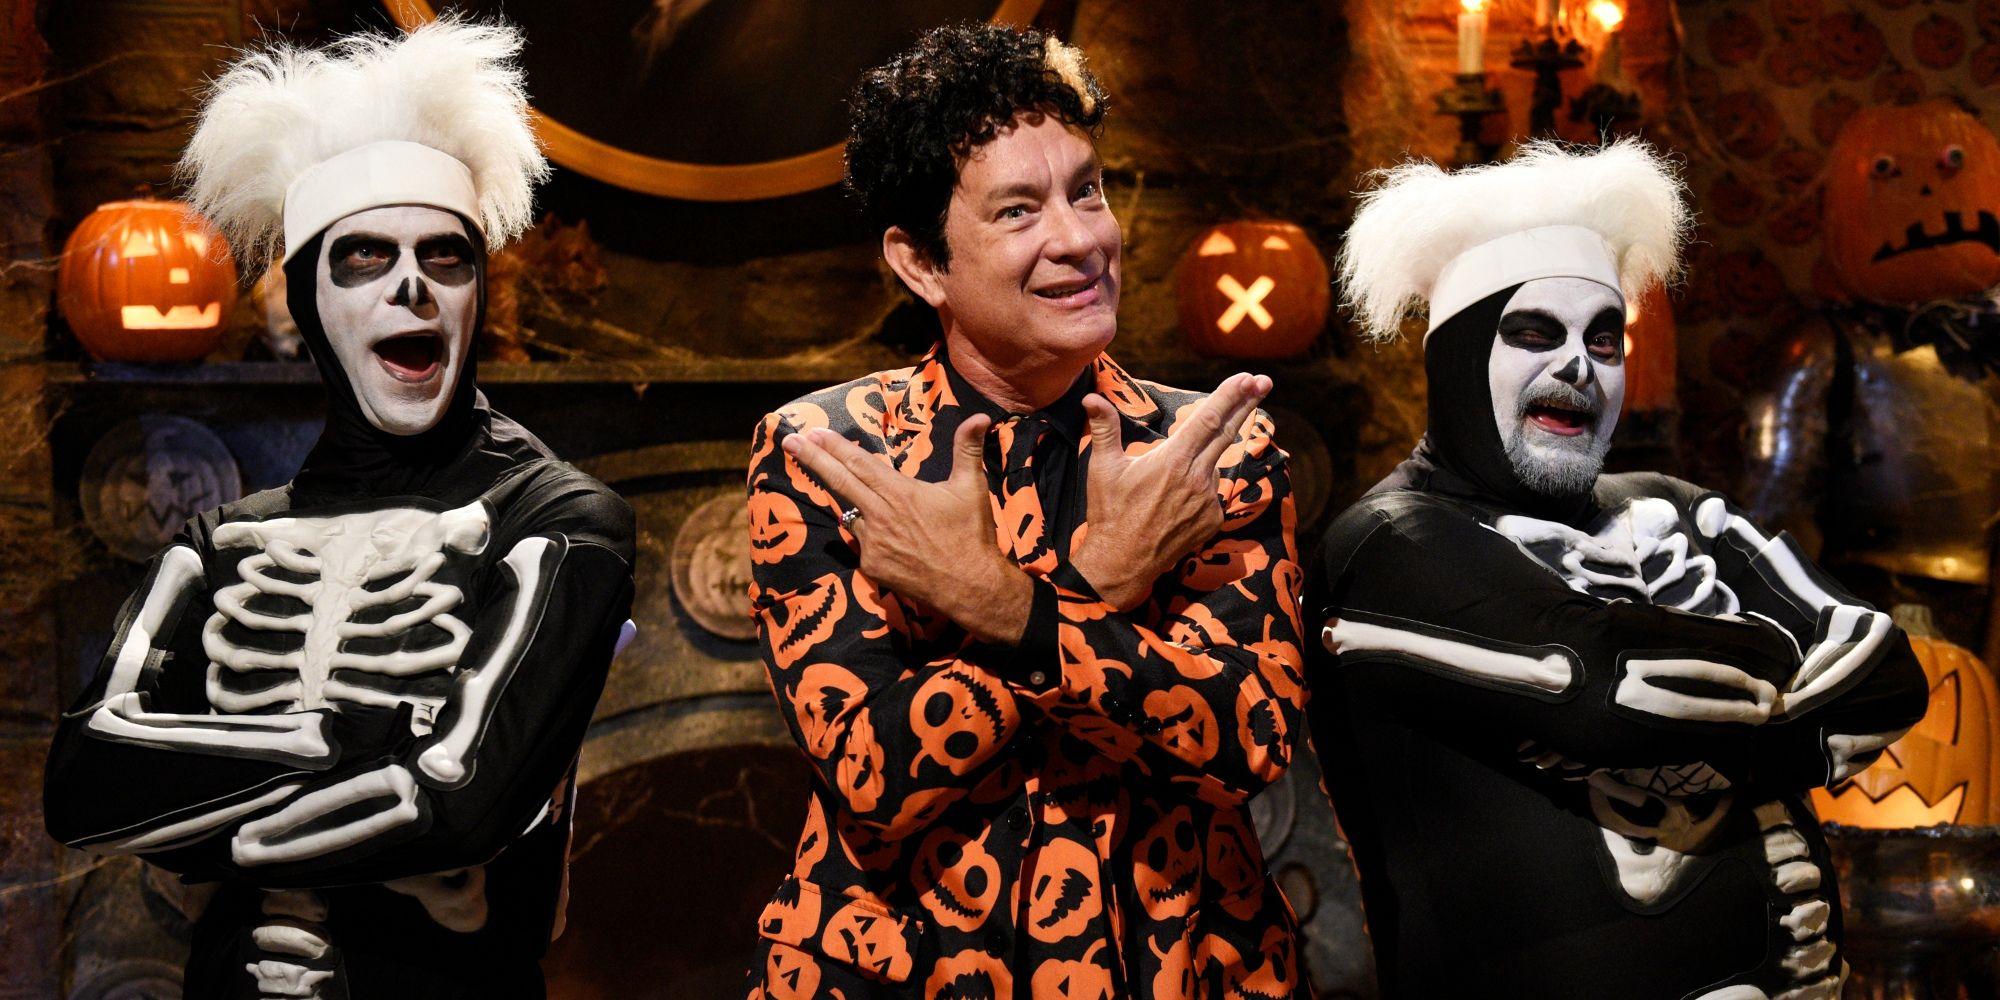 Saturday Night Live David S Pumpkins Adult Costume Wig One Size